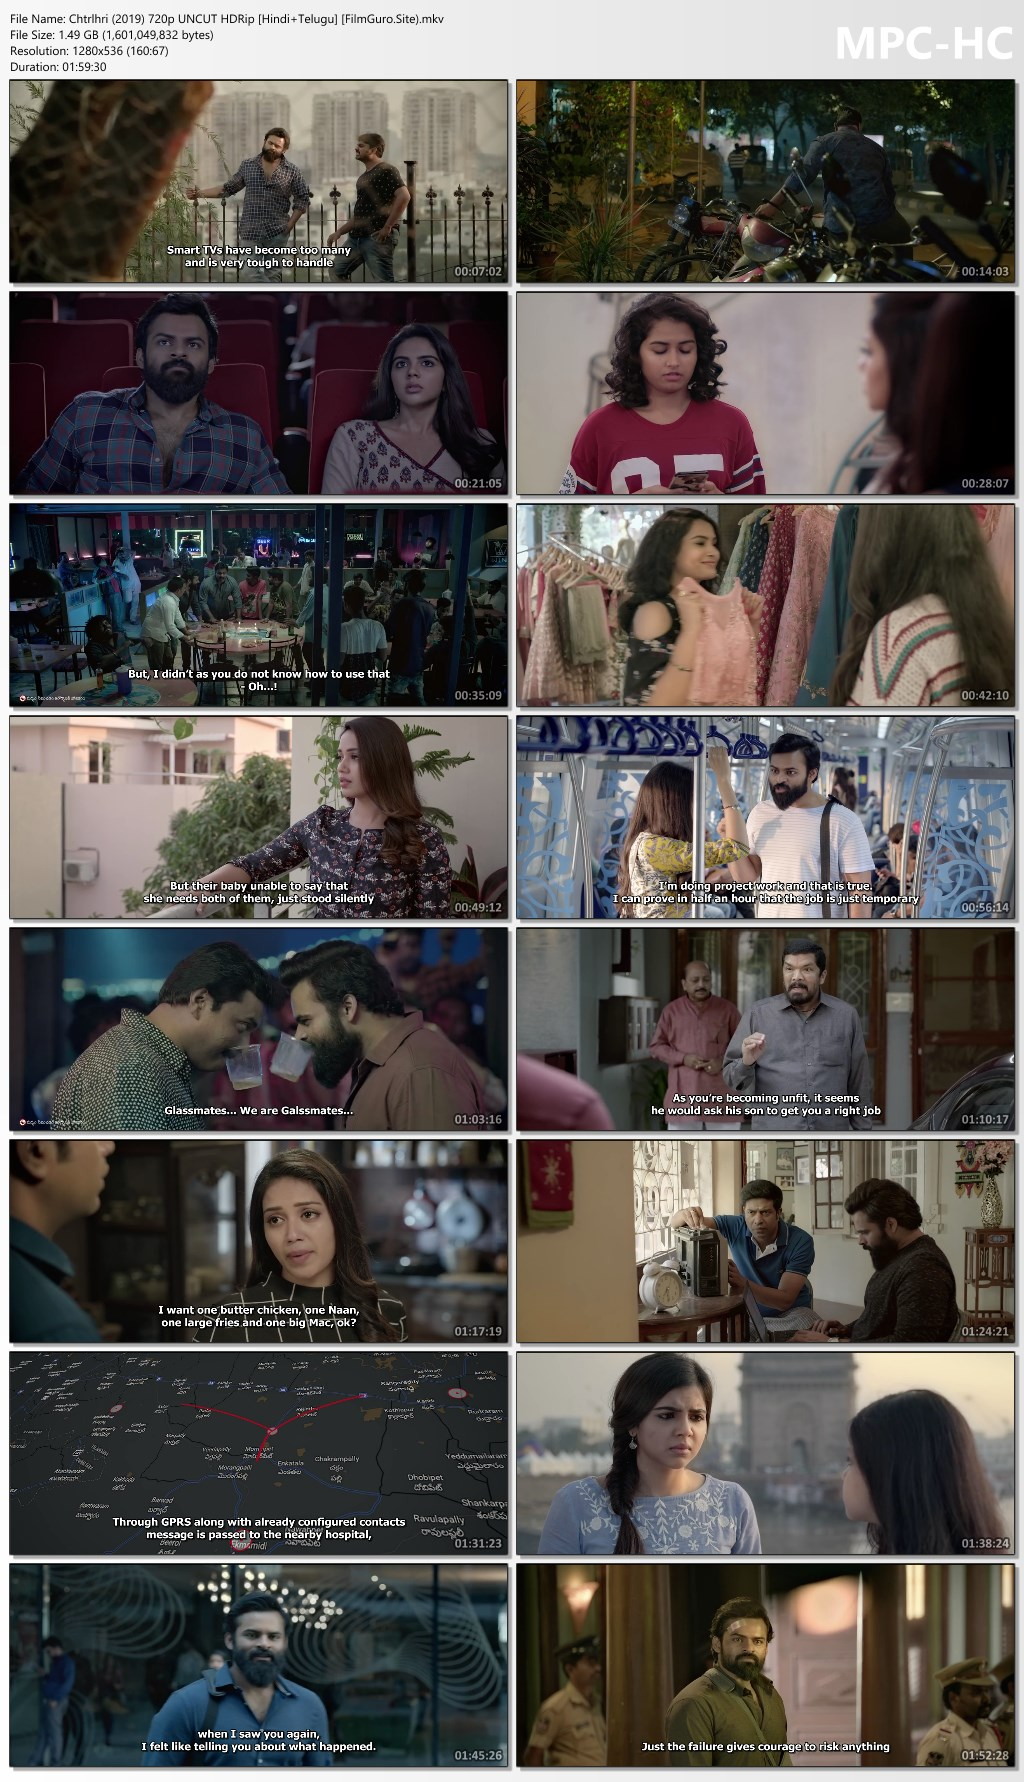 Chtrlhri-2019-720p-UNCUT-HDRip-Hindi-Telugu-Film-Guro-Site-mkv-thumbs